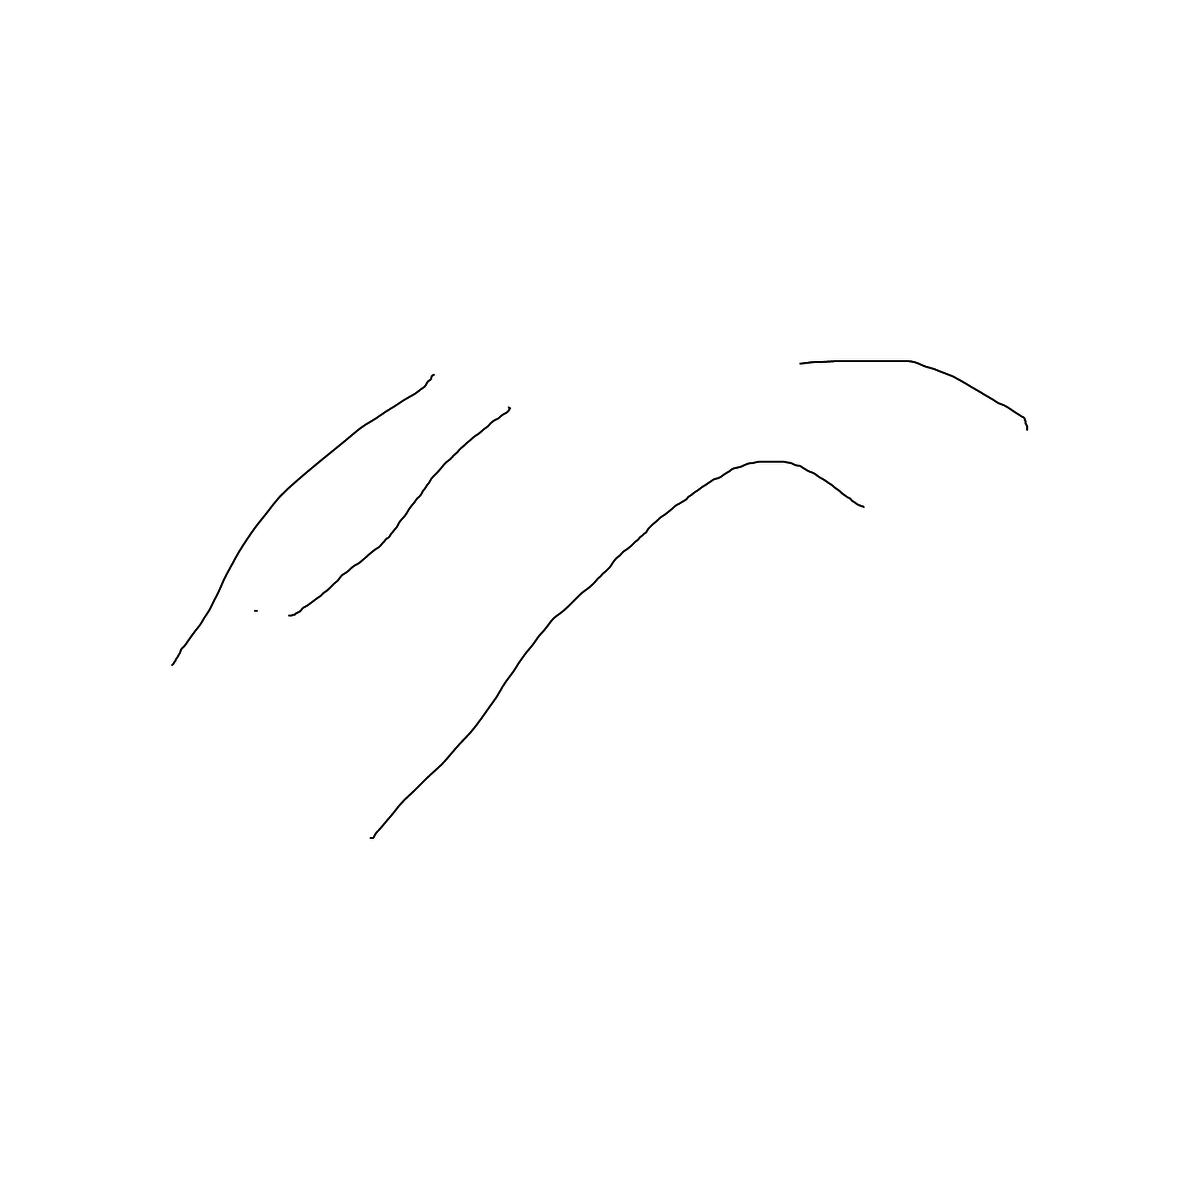 BAAAM drawing#398 lat:52.0689811706543000lng: 4.3254370689392090